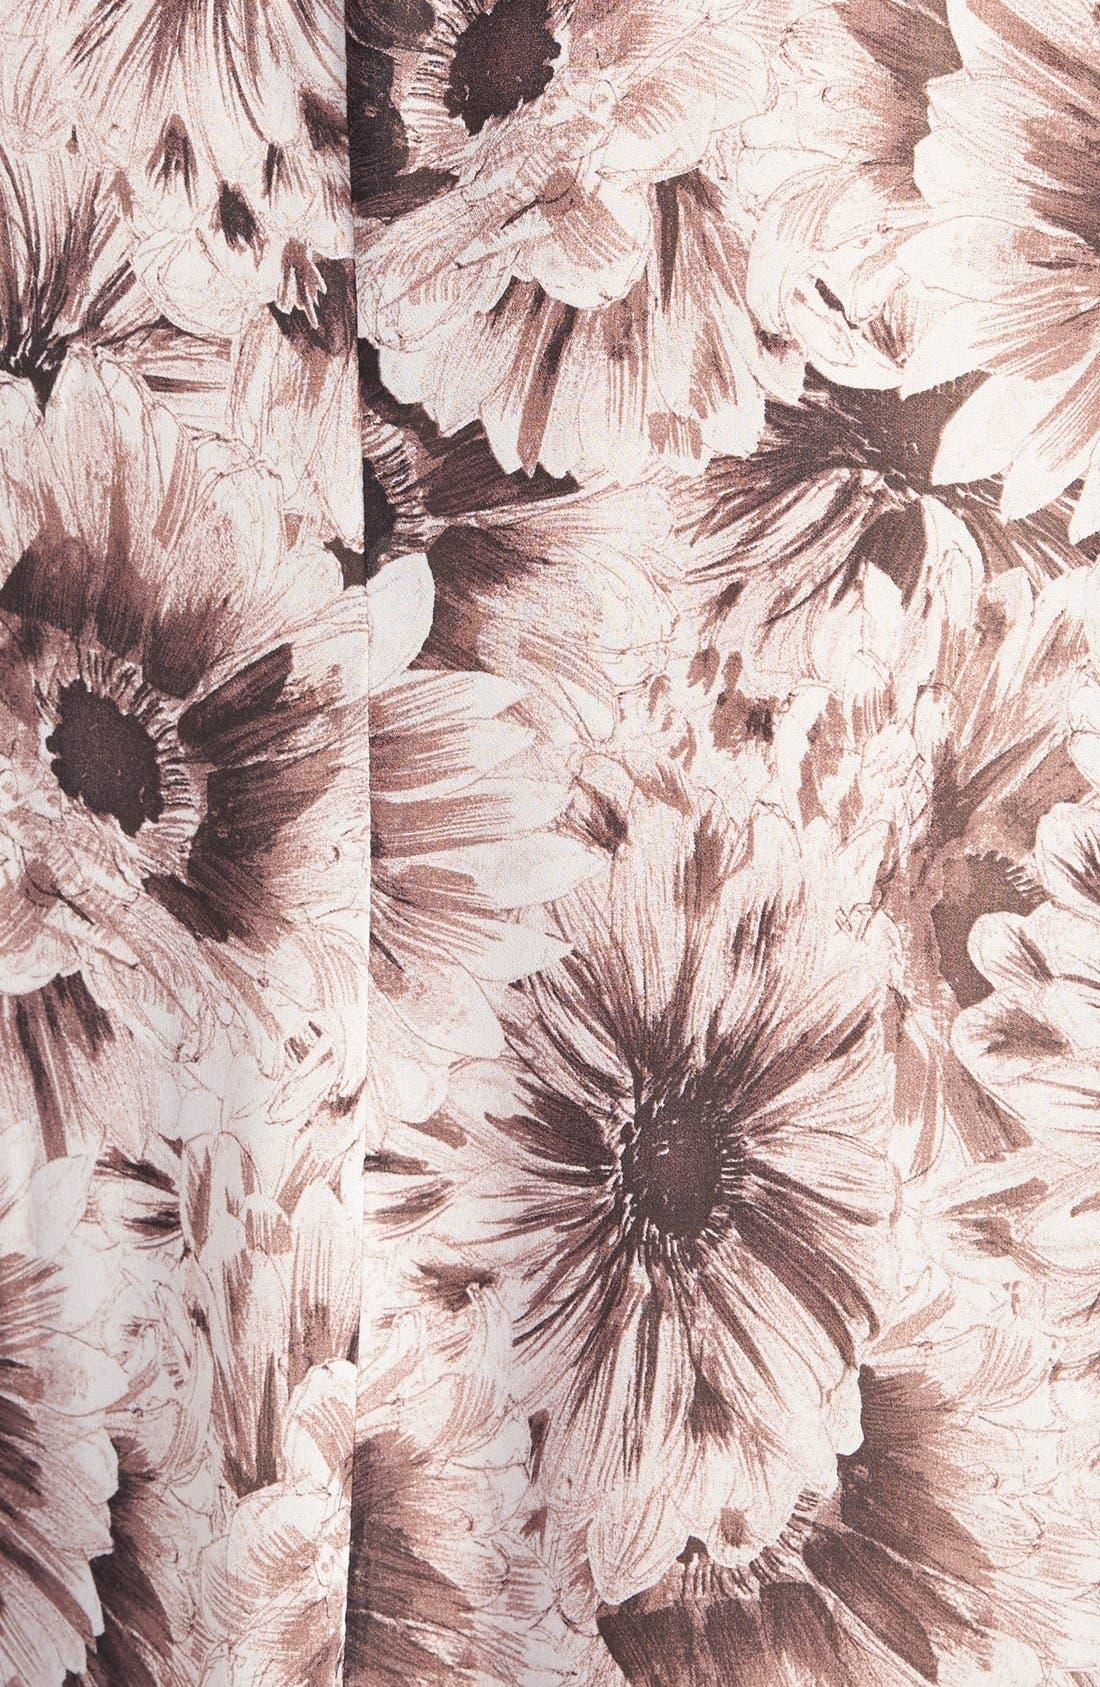 ASTR Lace Sleeve Shift Dress,                             Alternate thumbnail 3, color,                             Plum/ Black